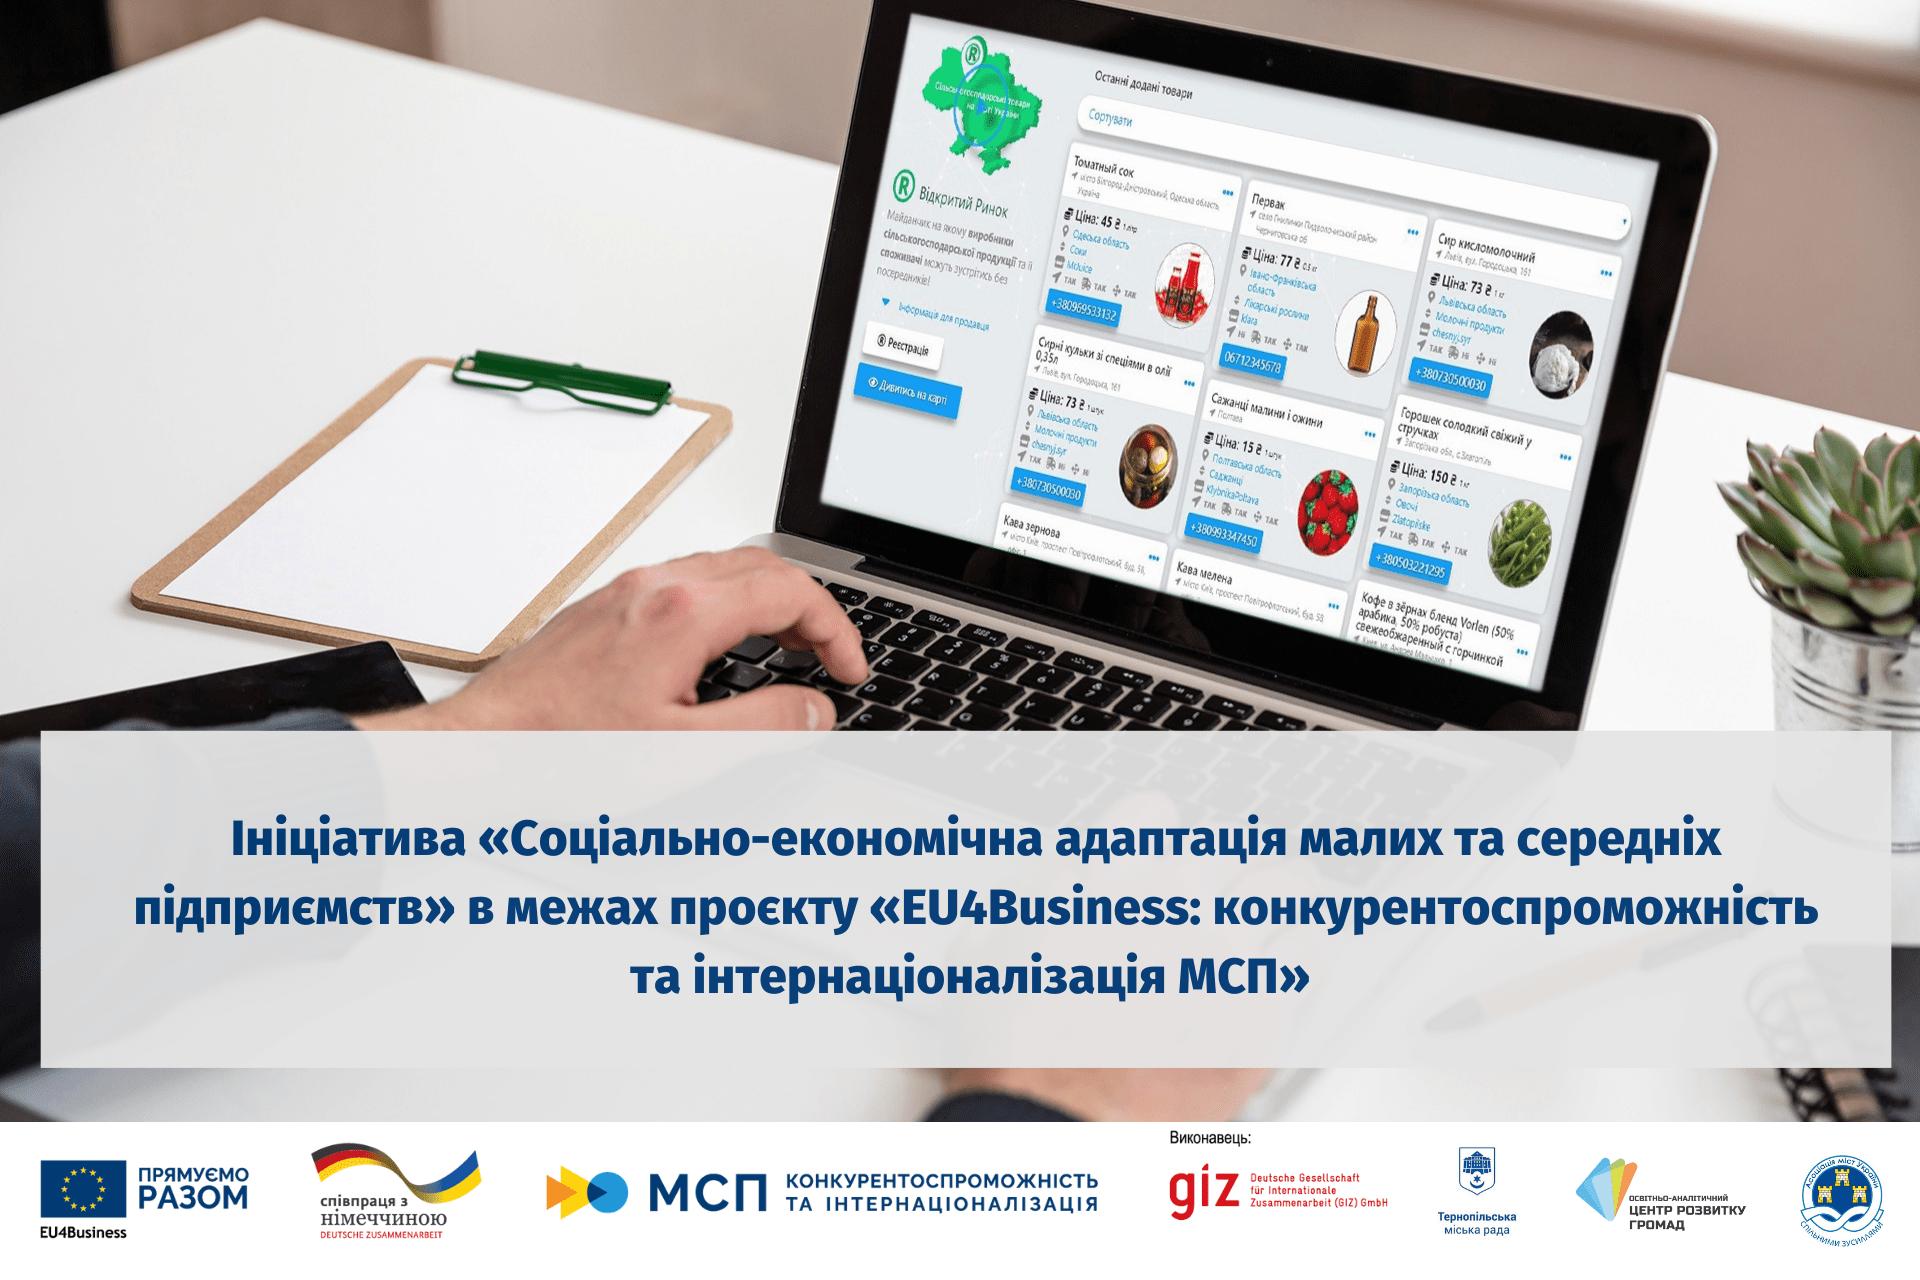 proiekt ekonomichna adaptatsiia malykh ta serednikh pidpryiemstv 14 - У Тернопільській громаді стартував проєкт для підприємців